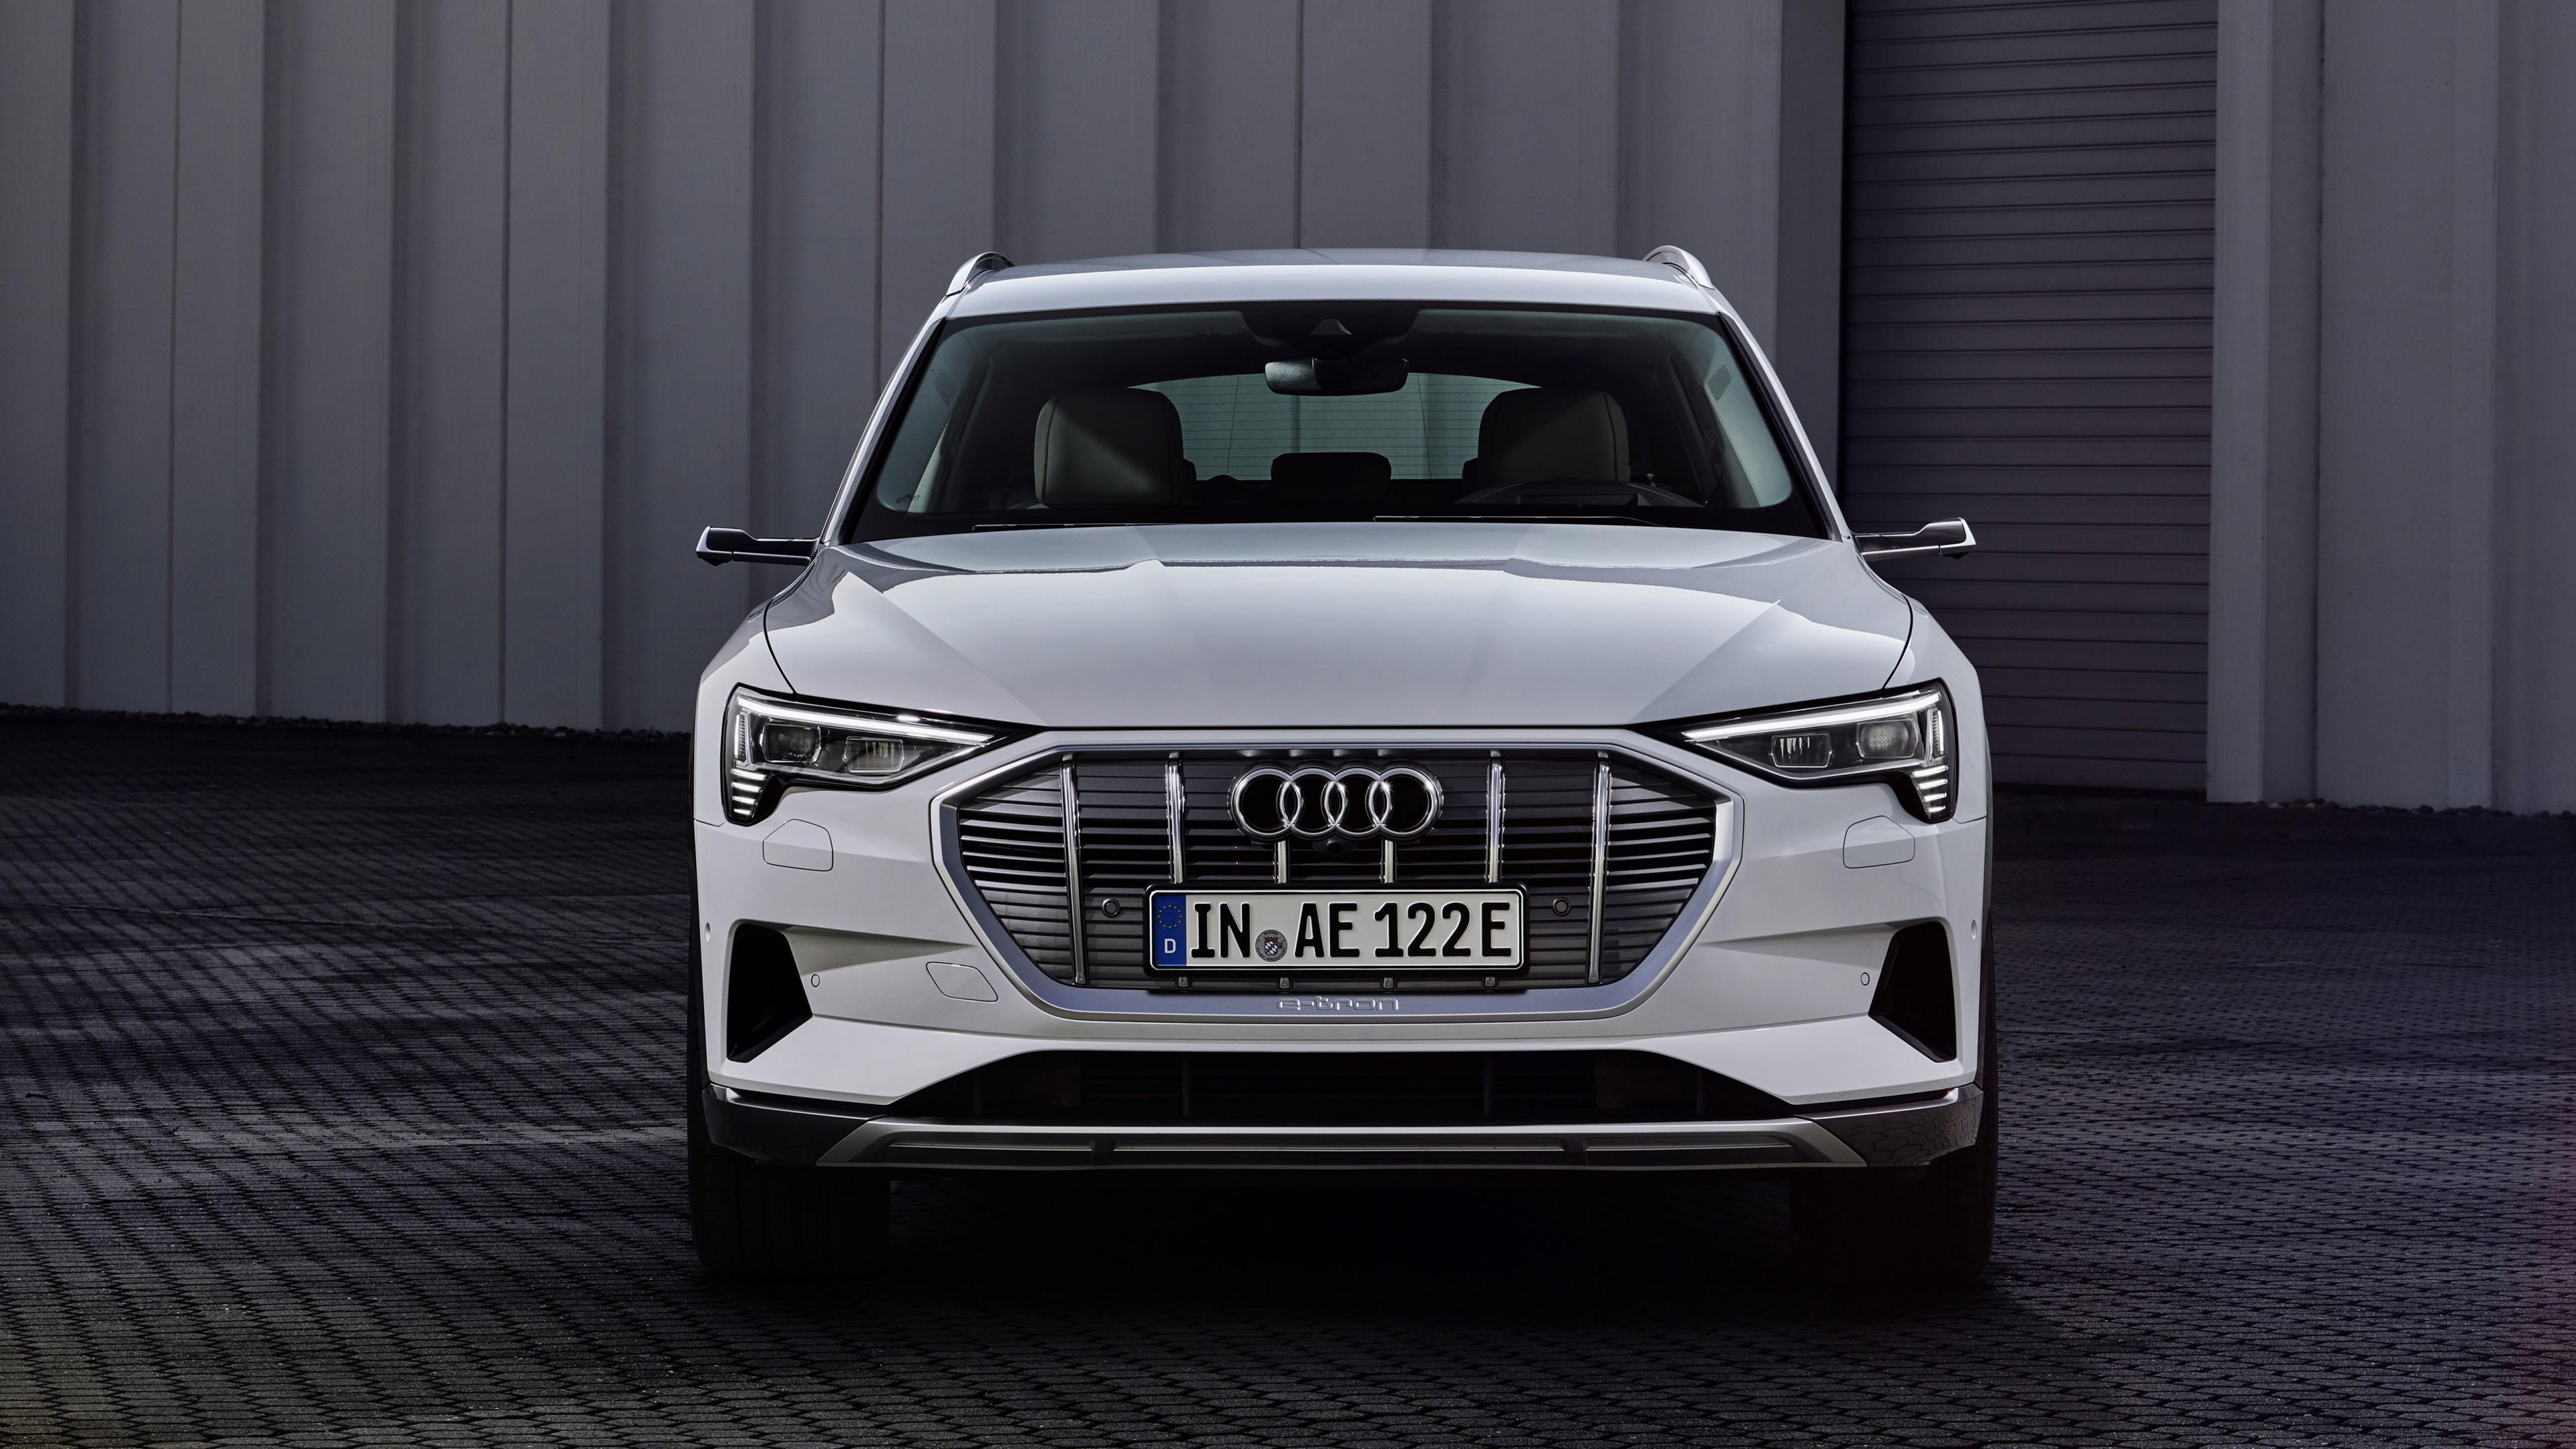 Audi E Tron 50 Quattro 2019 4k Wallpaper Hd Car Wallpapers Id 12949